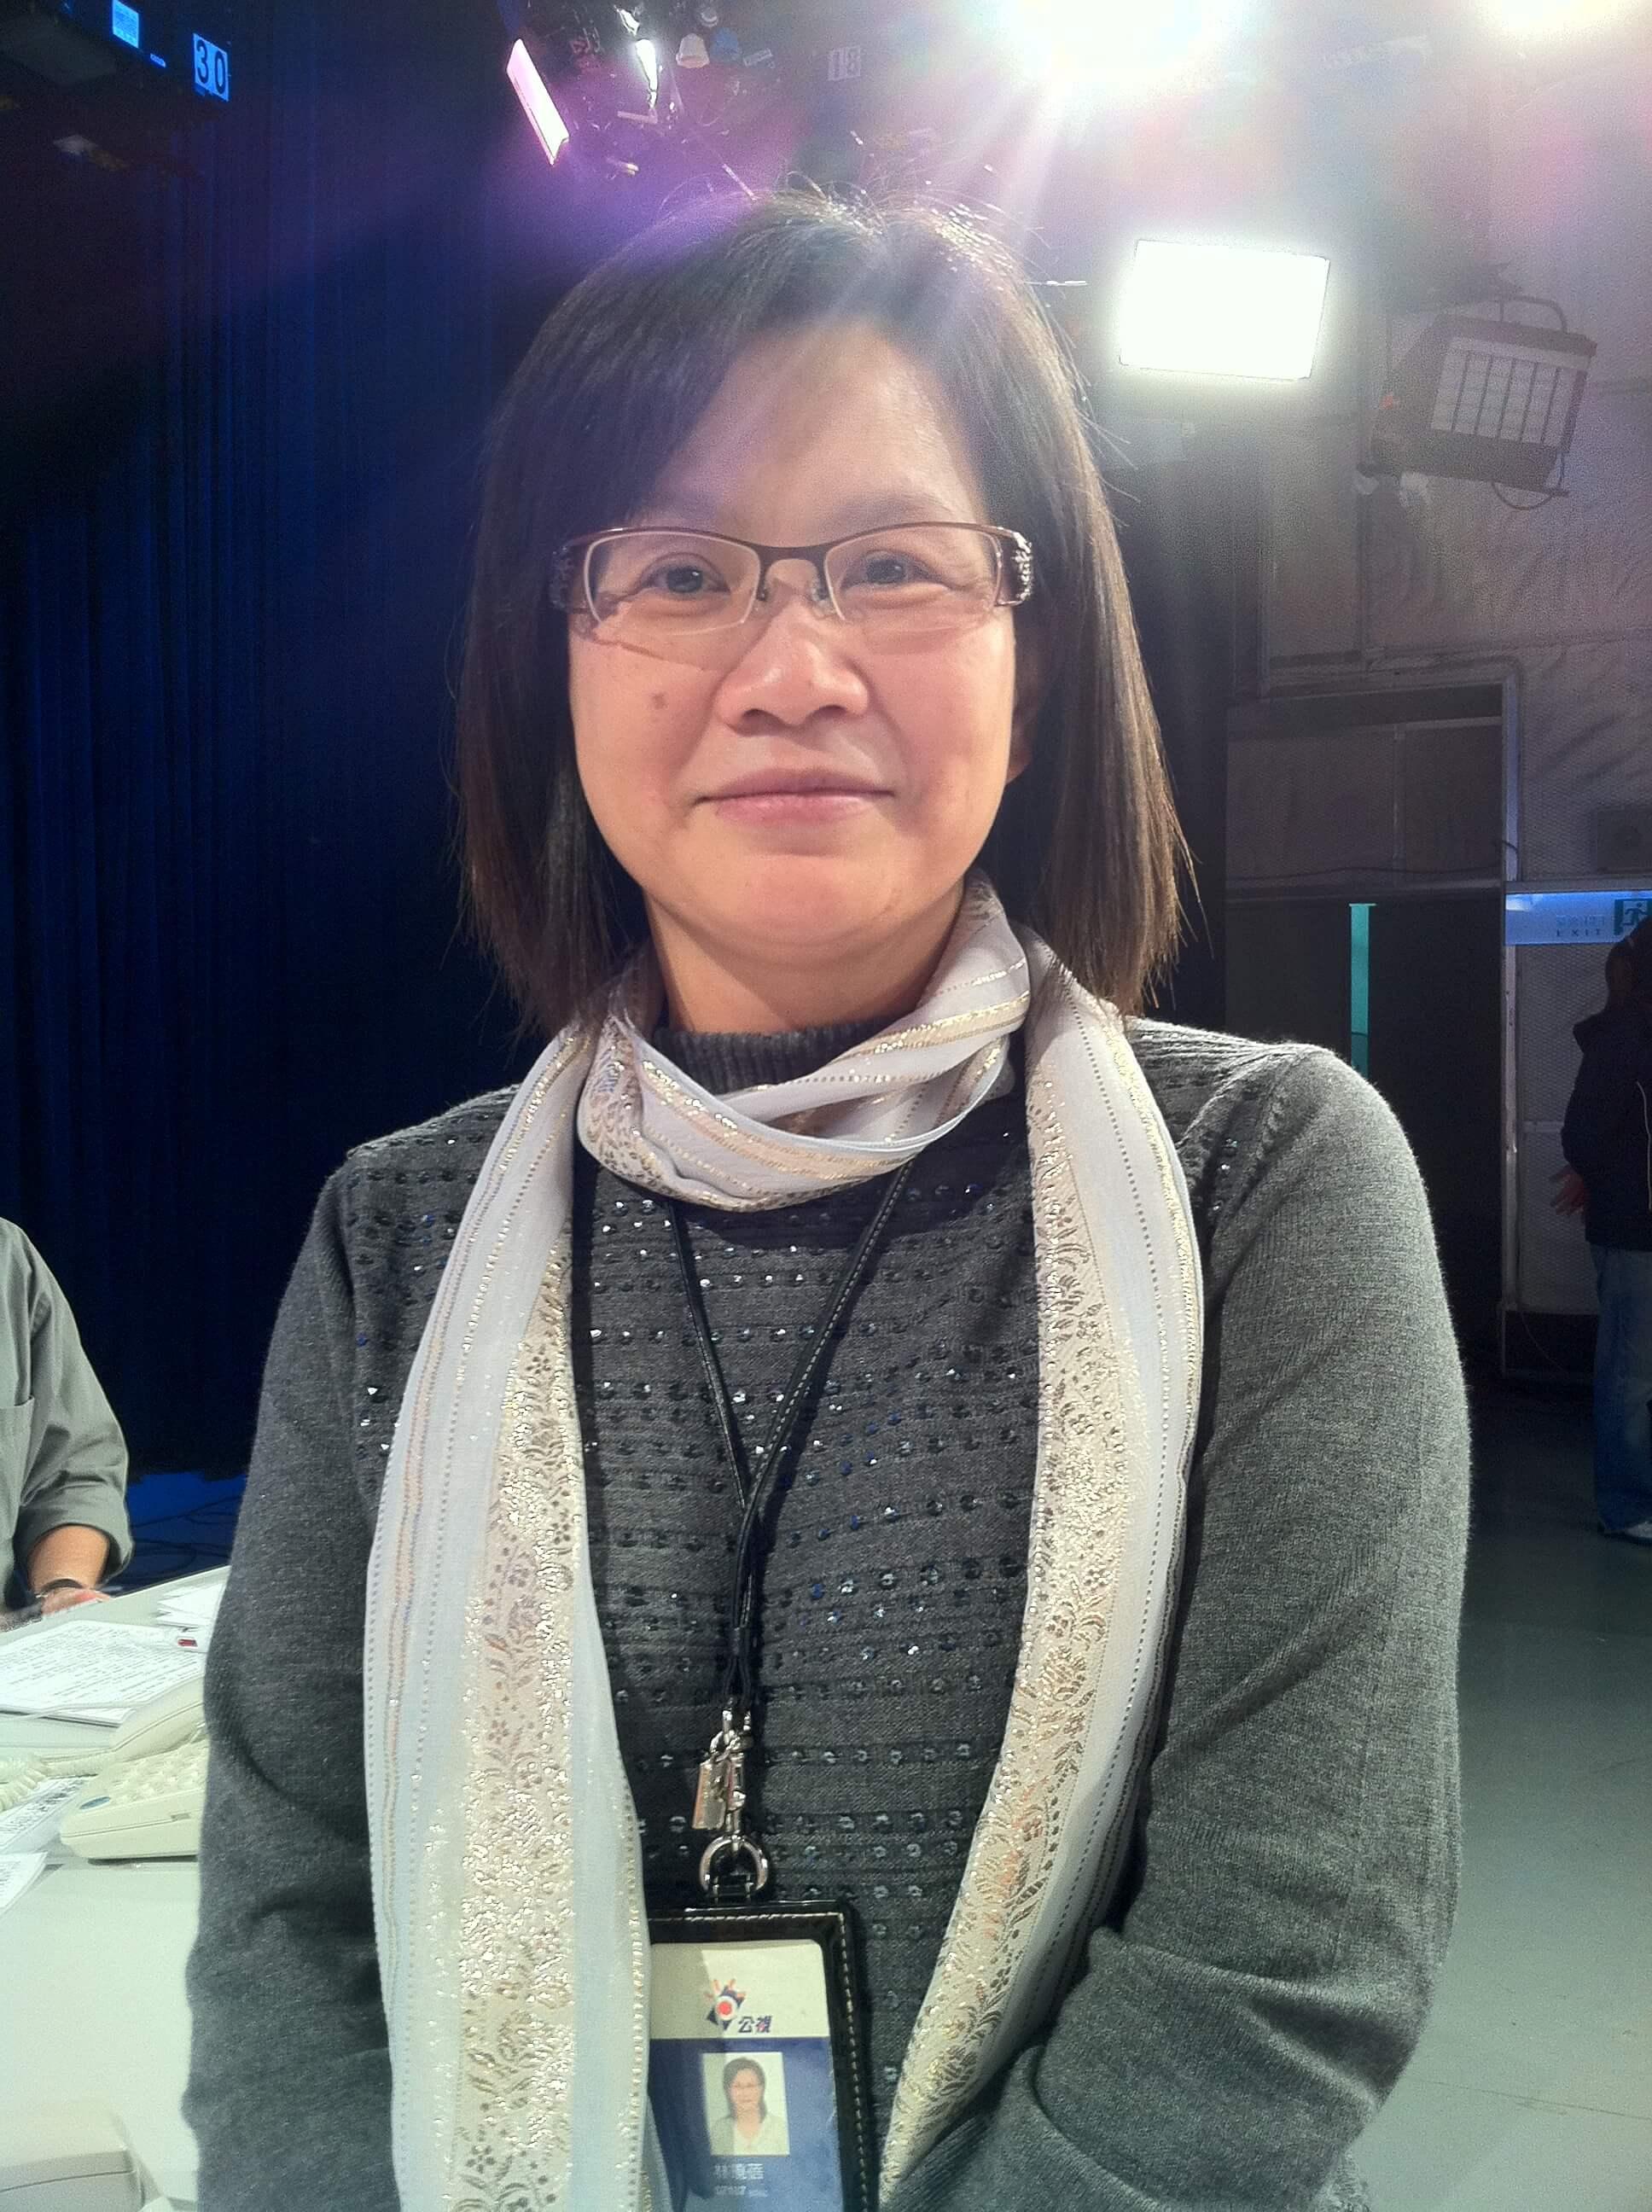 Lin Hsiao Pei